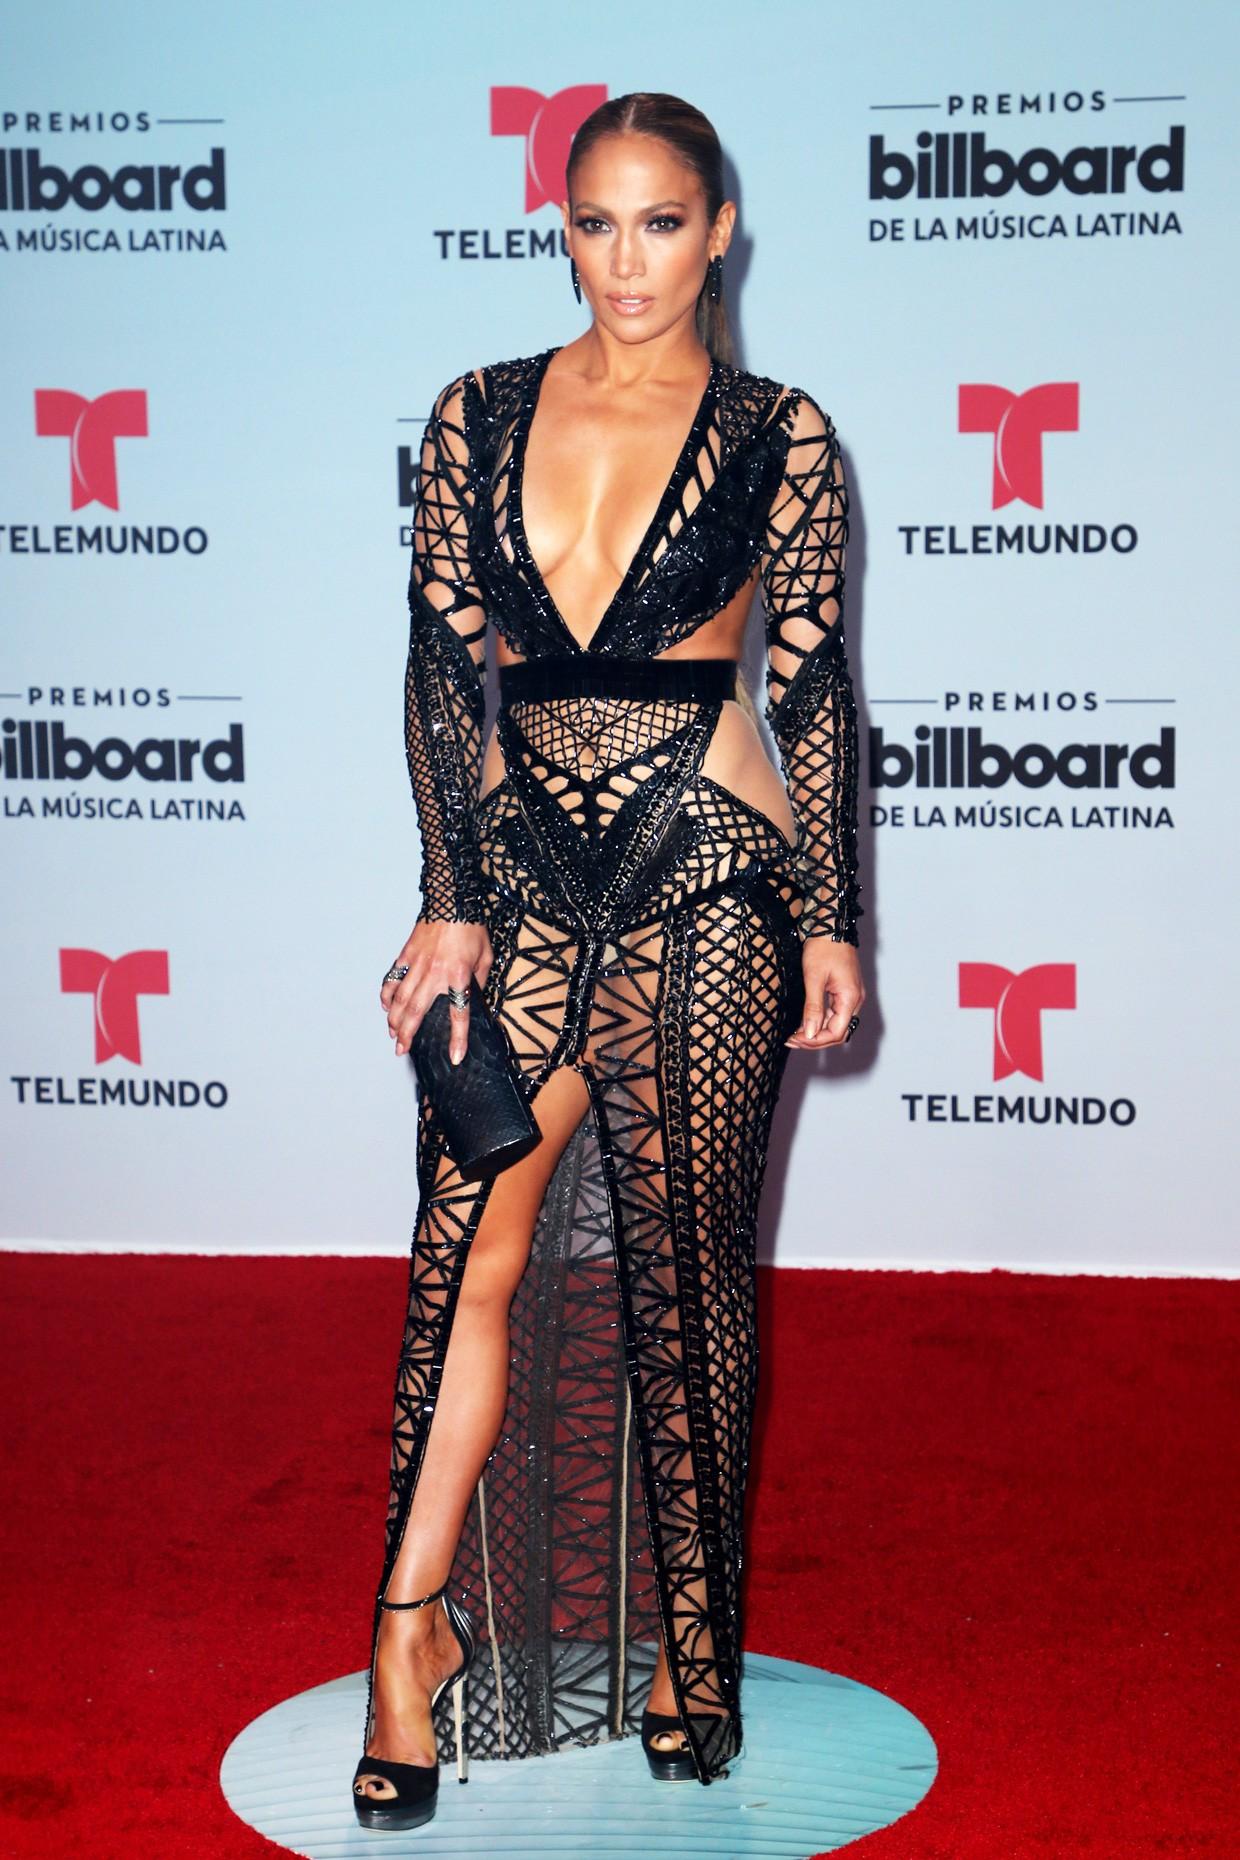 2017 Billboard Latin Music Awards: See The Red Carpet Photos | Billboard | Billboard